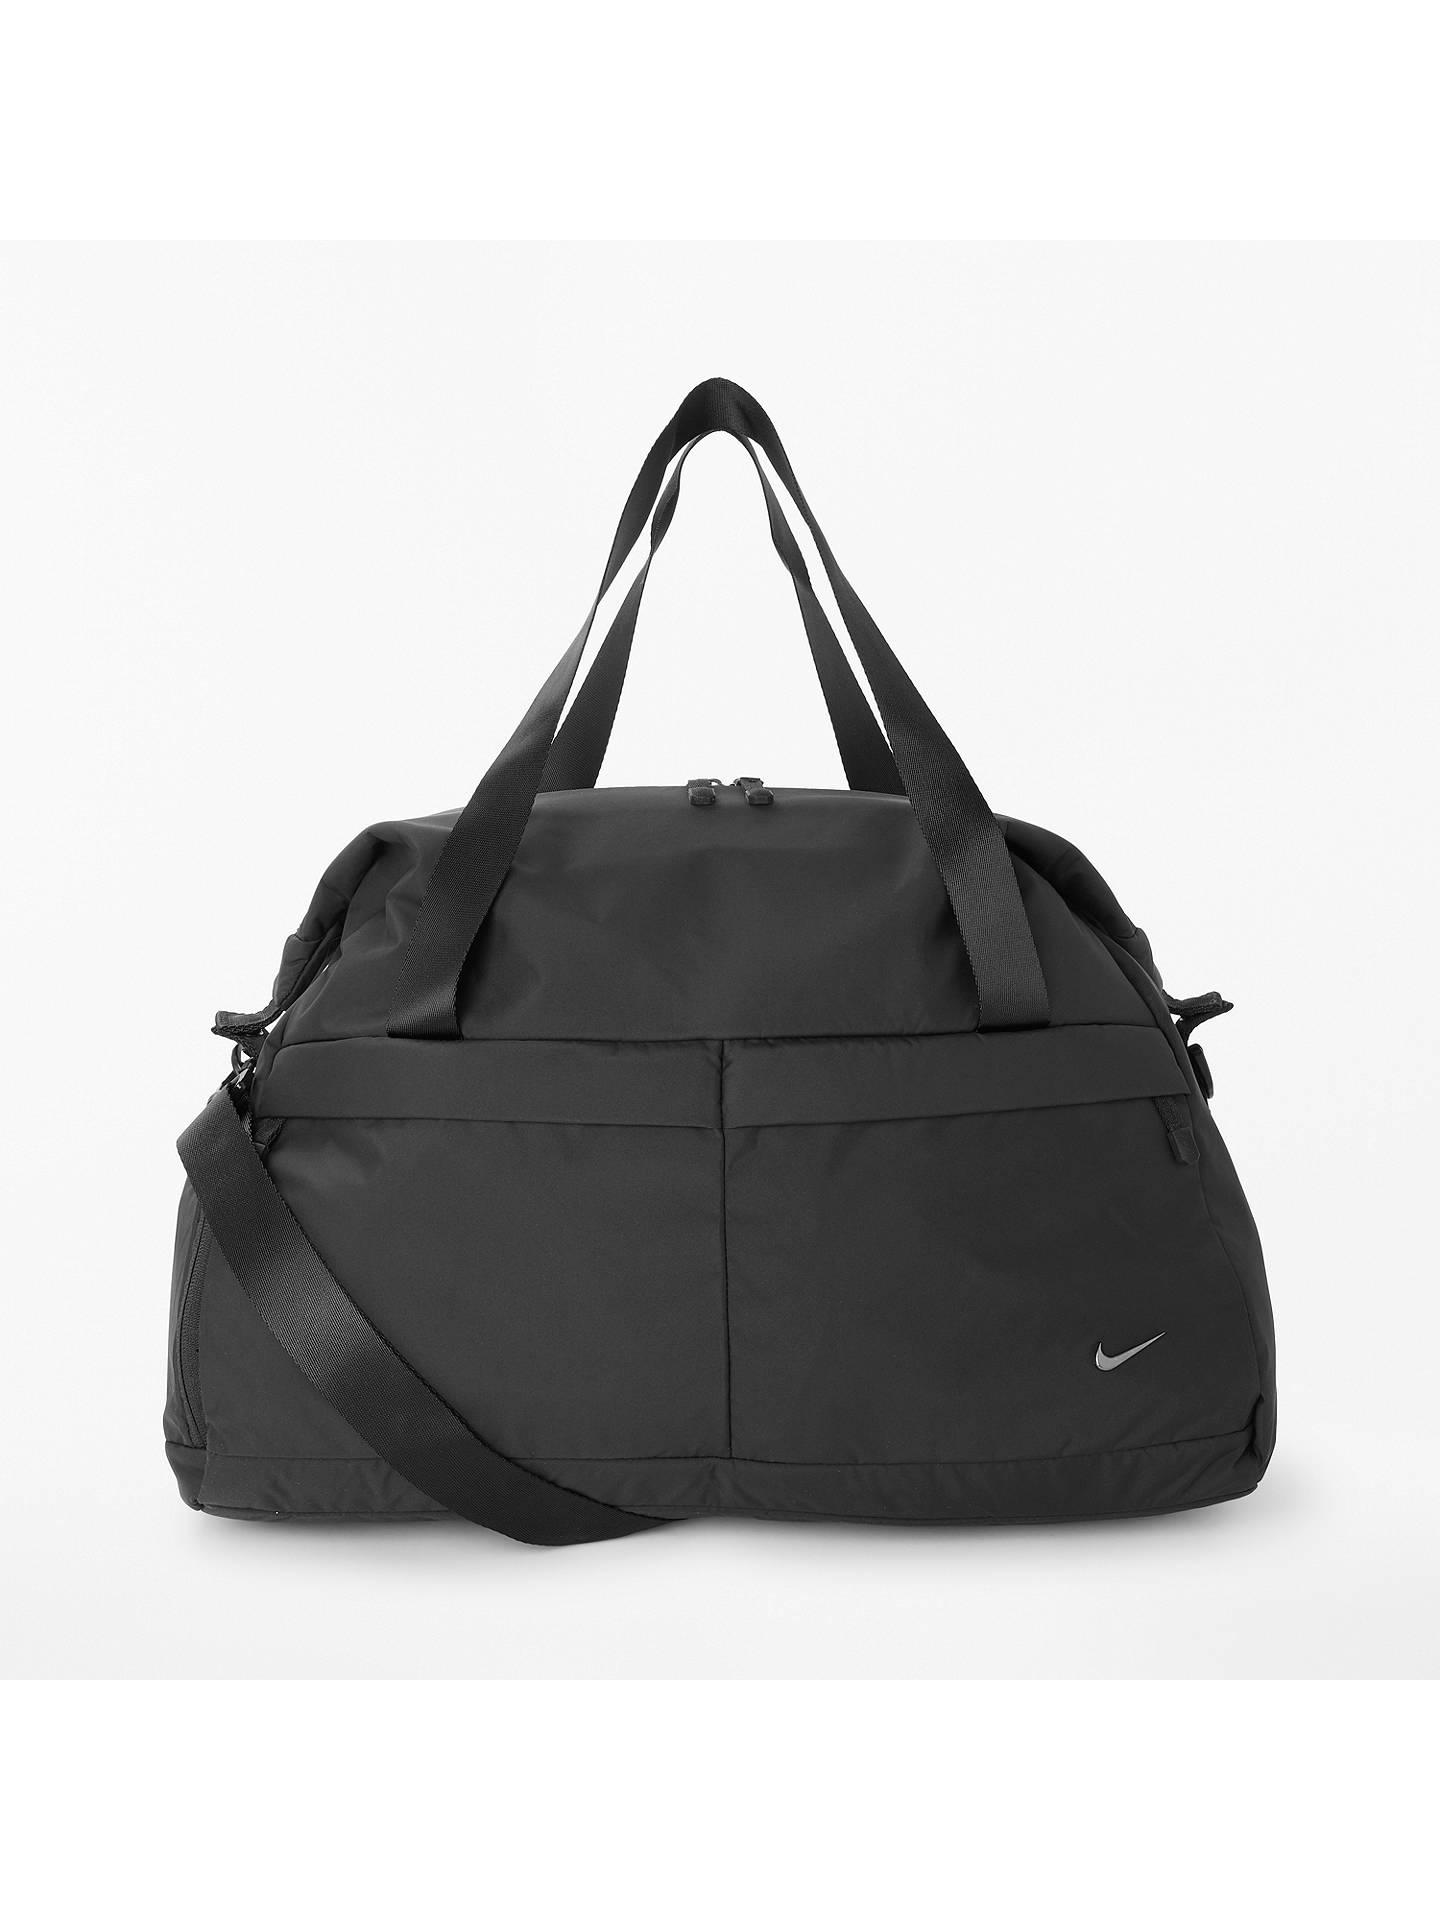 d87454f47d8 Buy Nike Legend Club Training Bag, Binary Blue/Black Online at  johnlewis.com ...